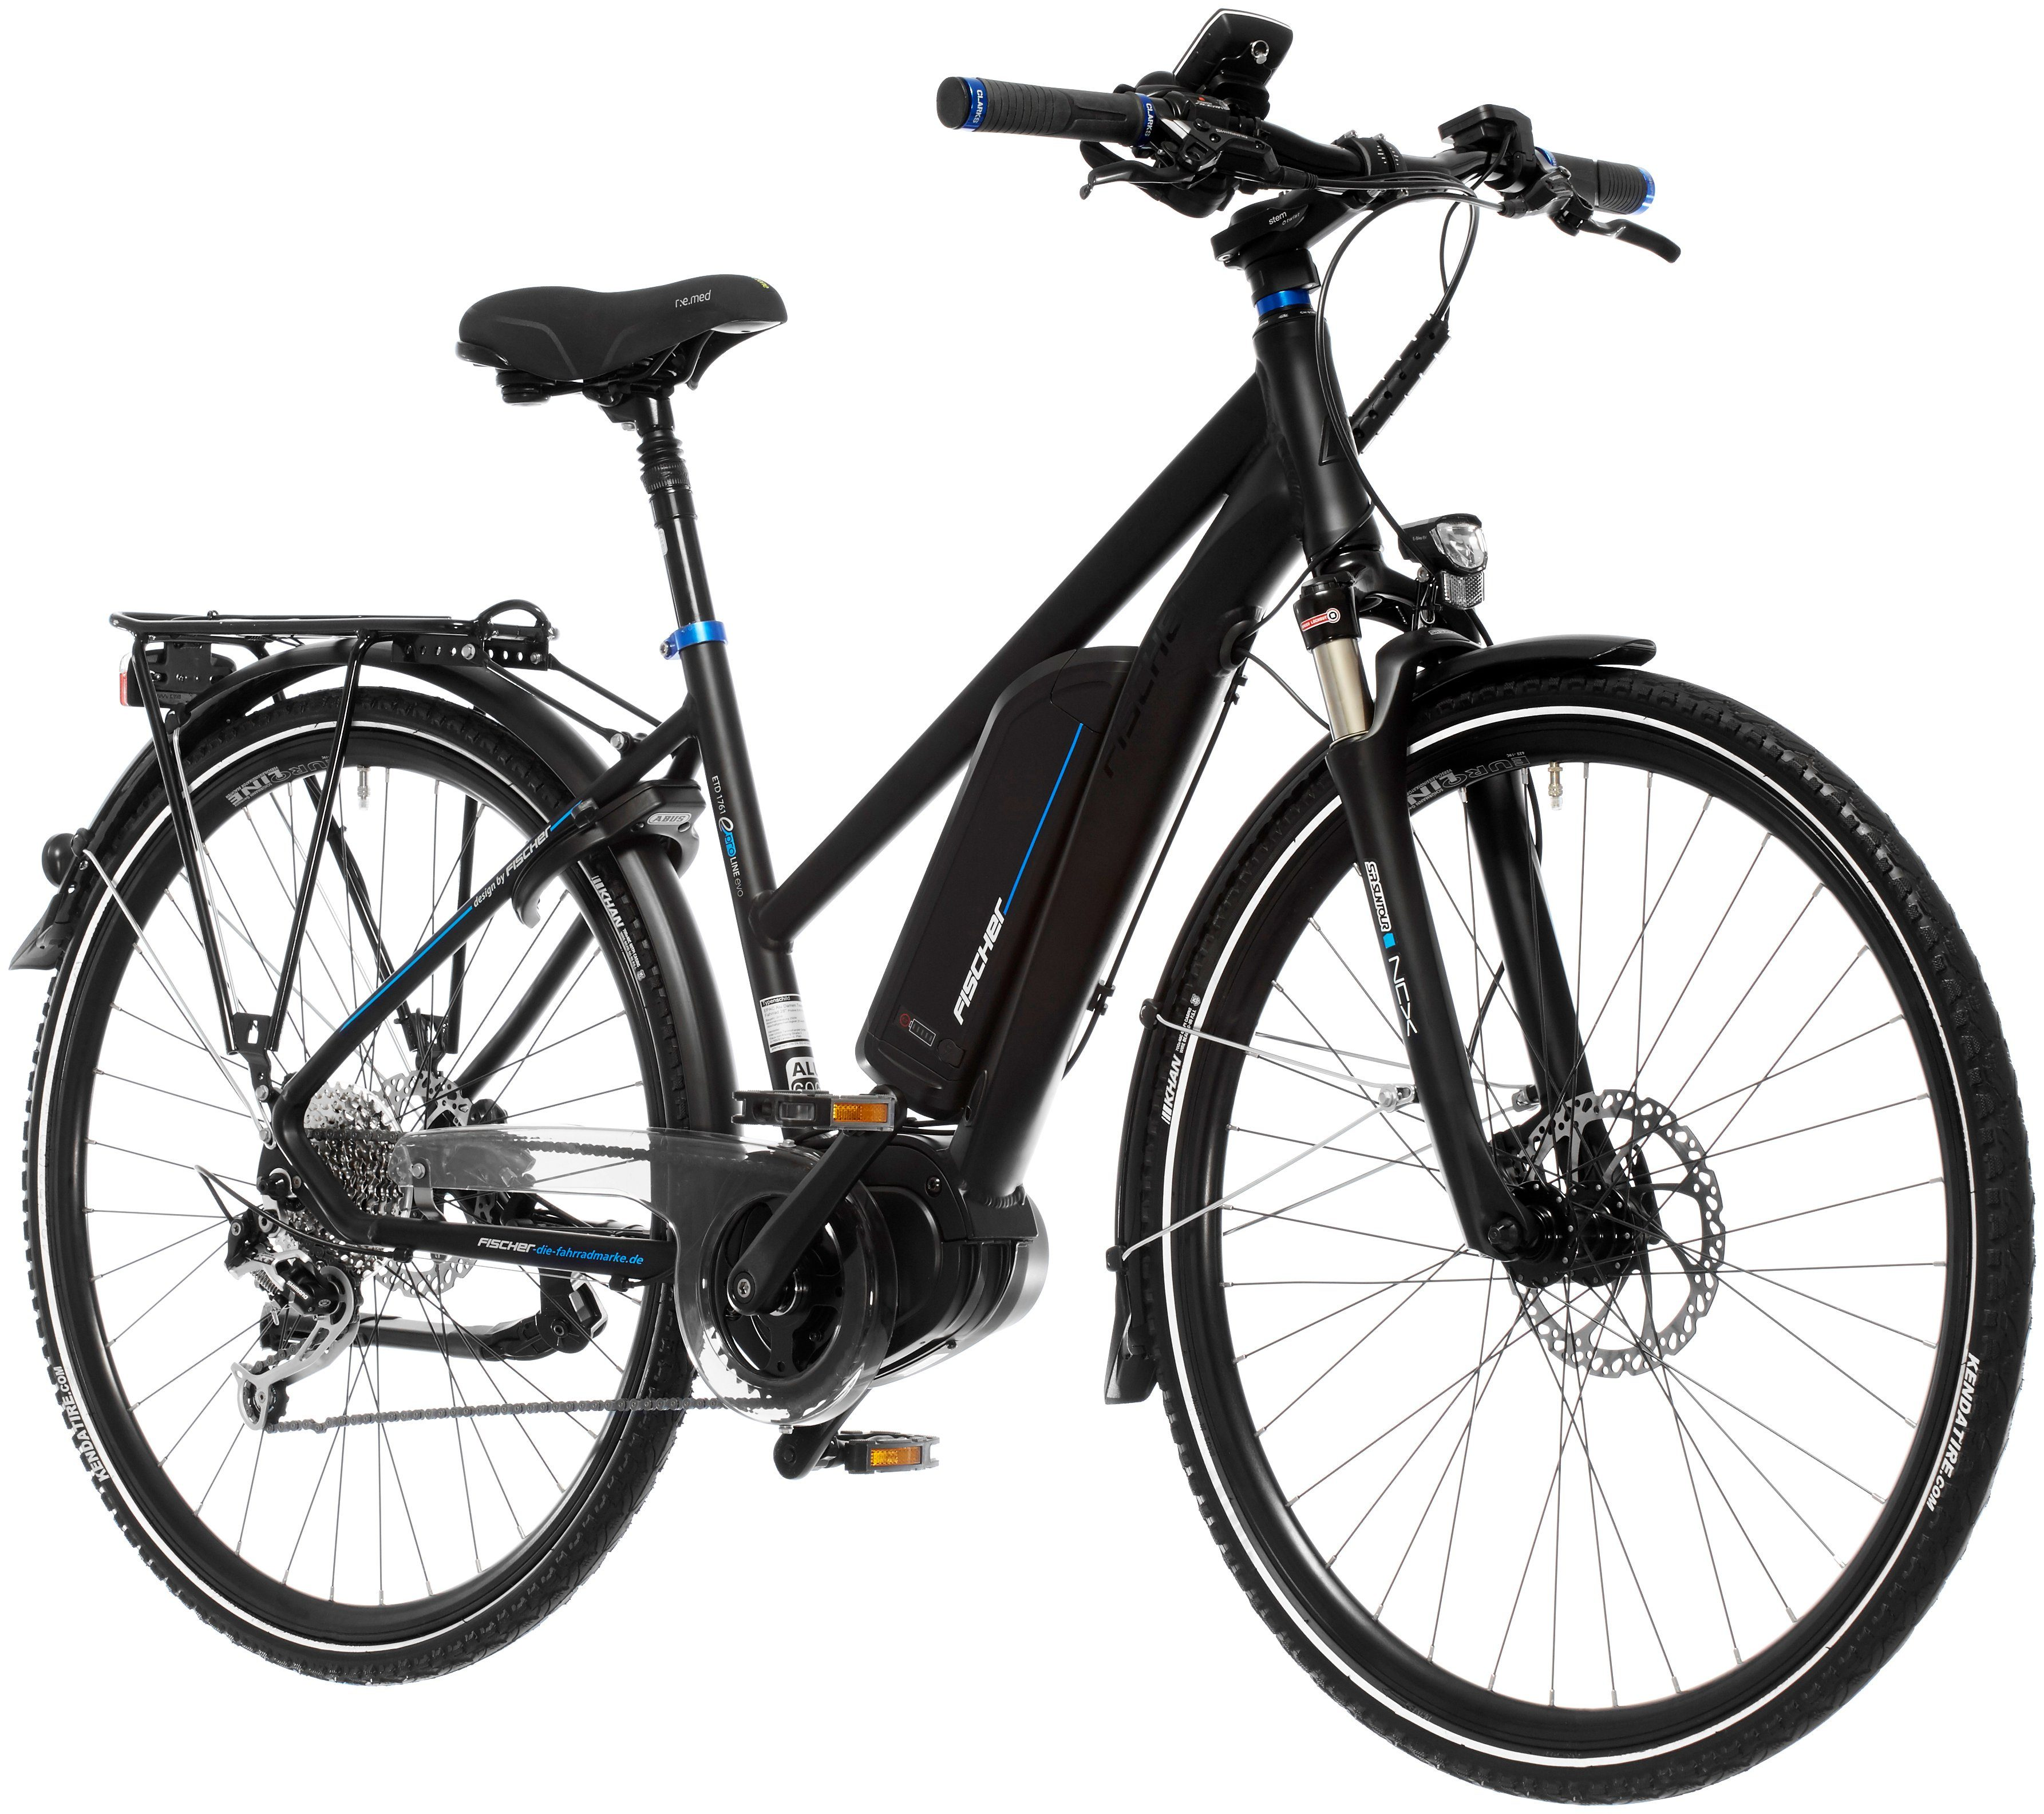 FISCHER FAHRRAEDER E-Bike Trekking Damen »ETD 1761-R1«, 28 Zoll, 9 Gang, Mittelmotor, 557 Wh